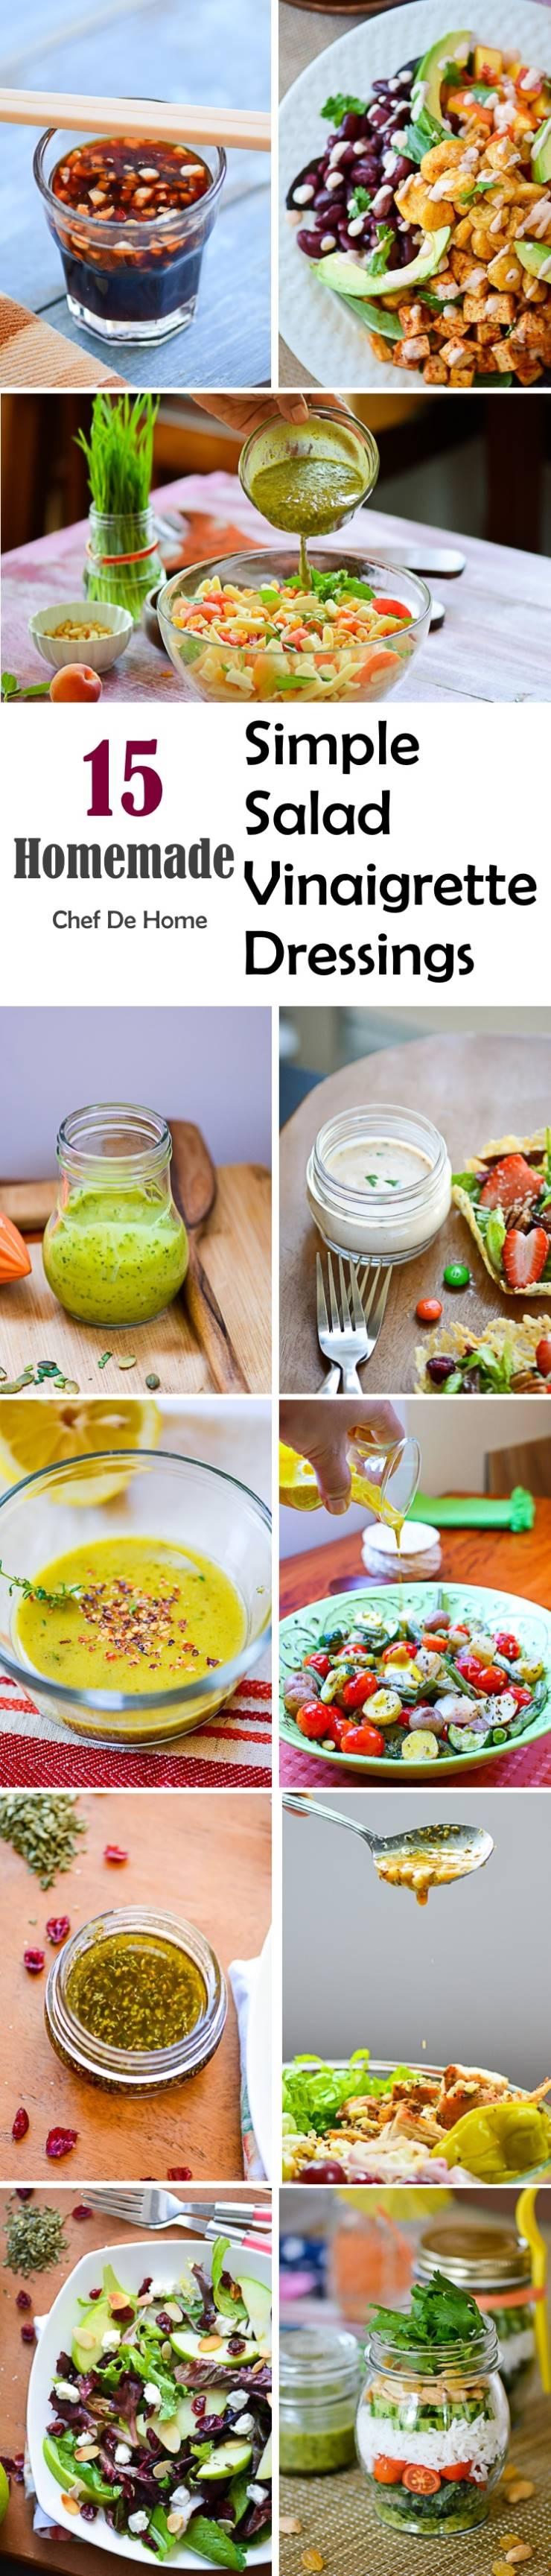 15 Homemade Simple Salad Vinaigrette Dressings